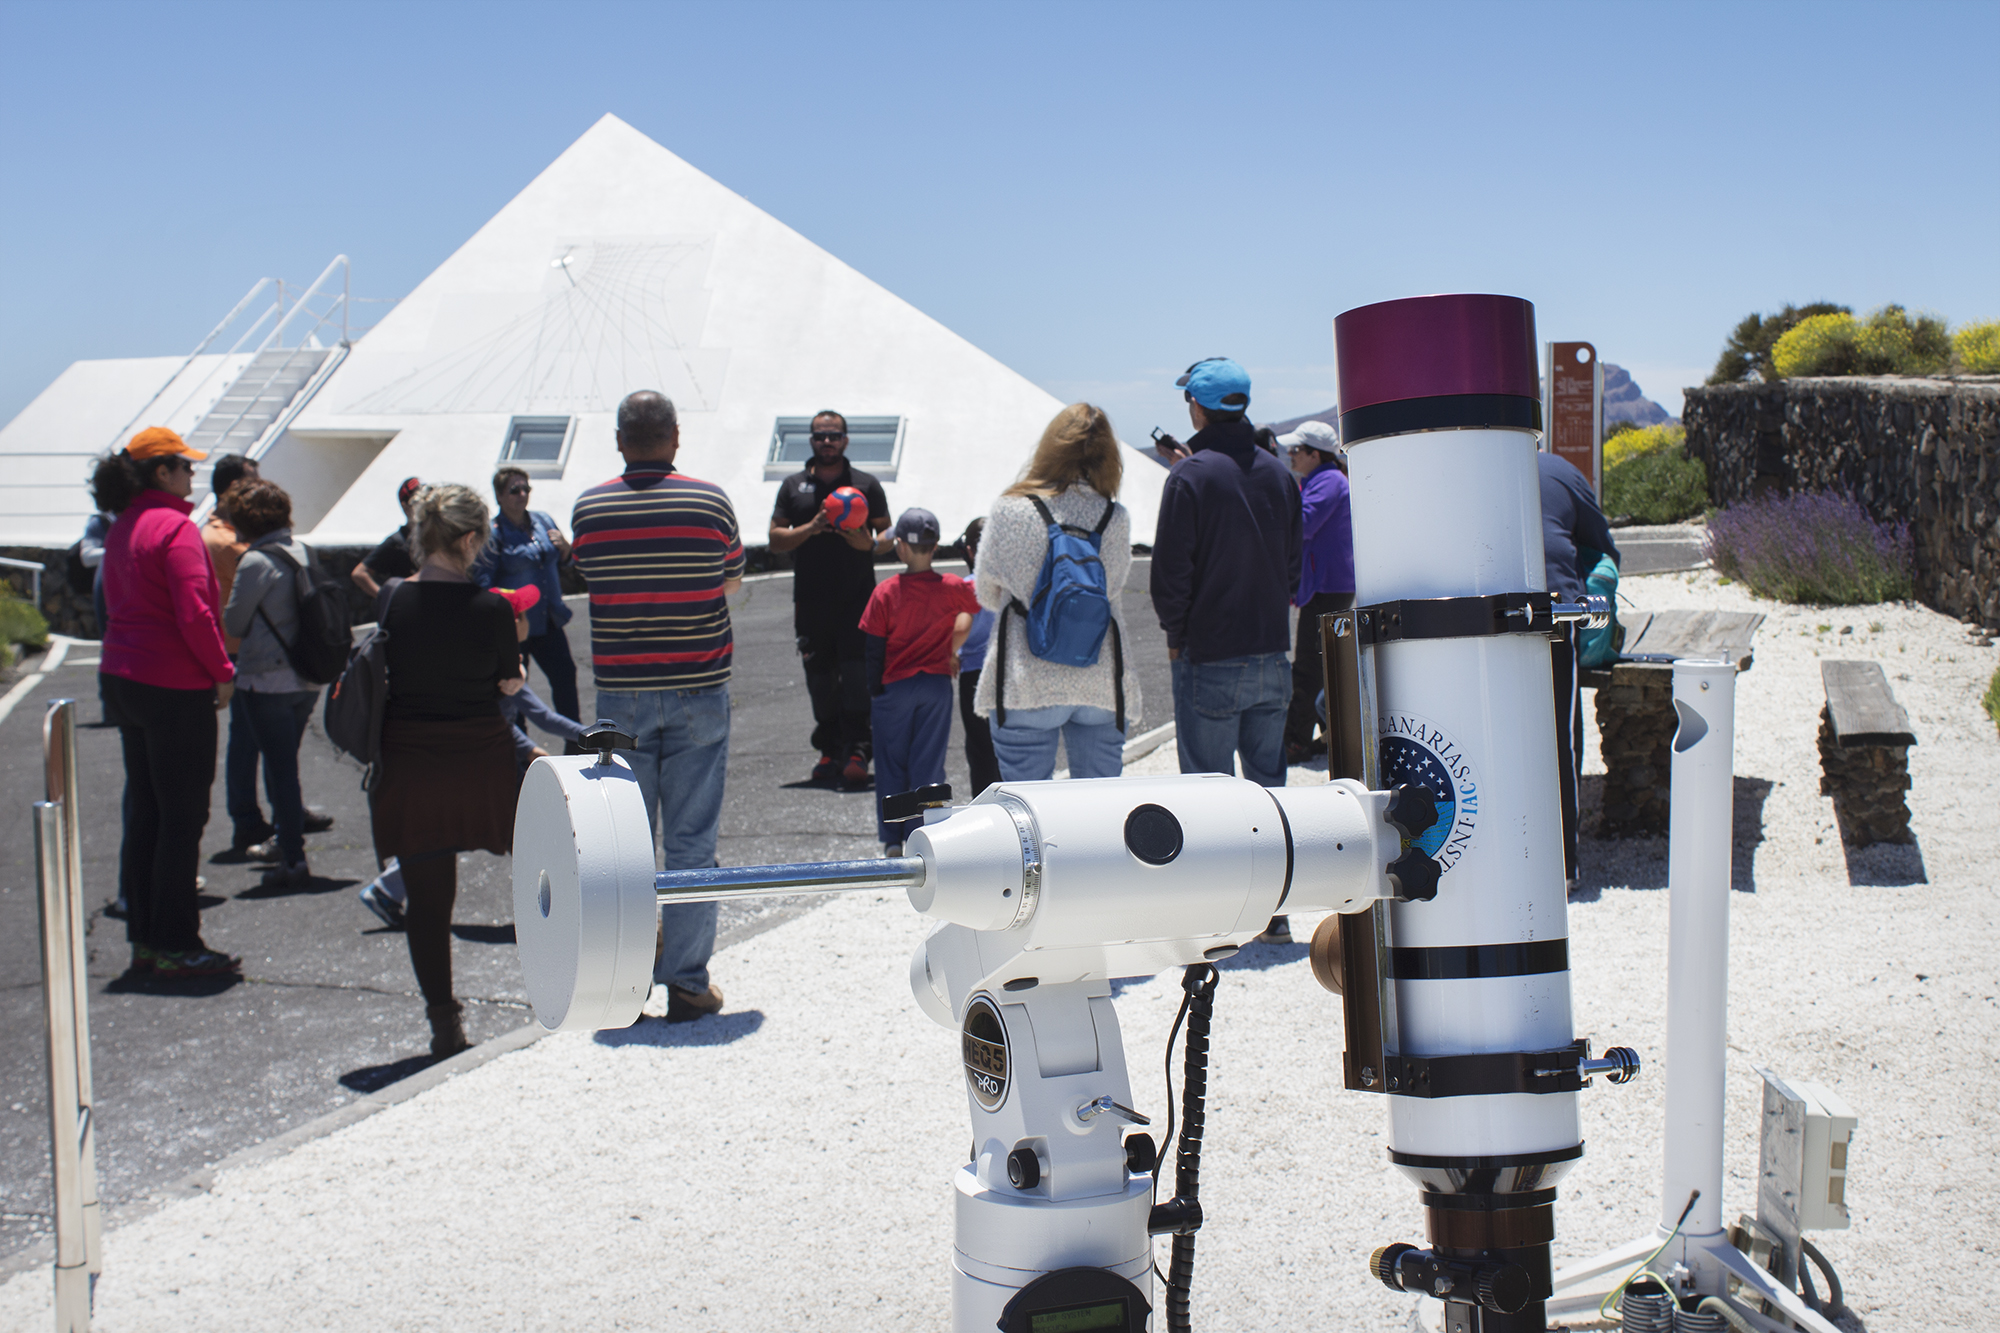 Visiter l'Observatoire du Teide avec des enfants